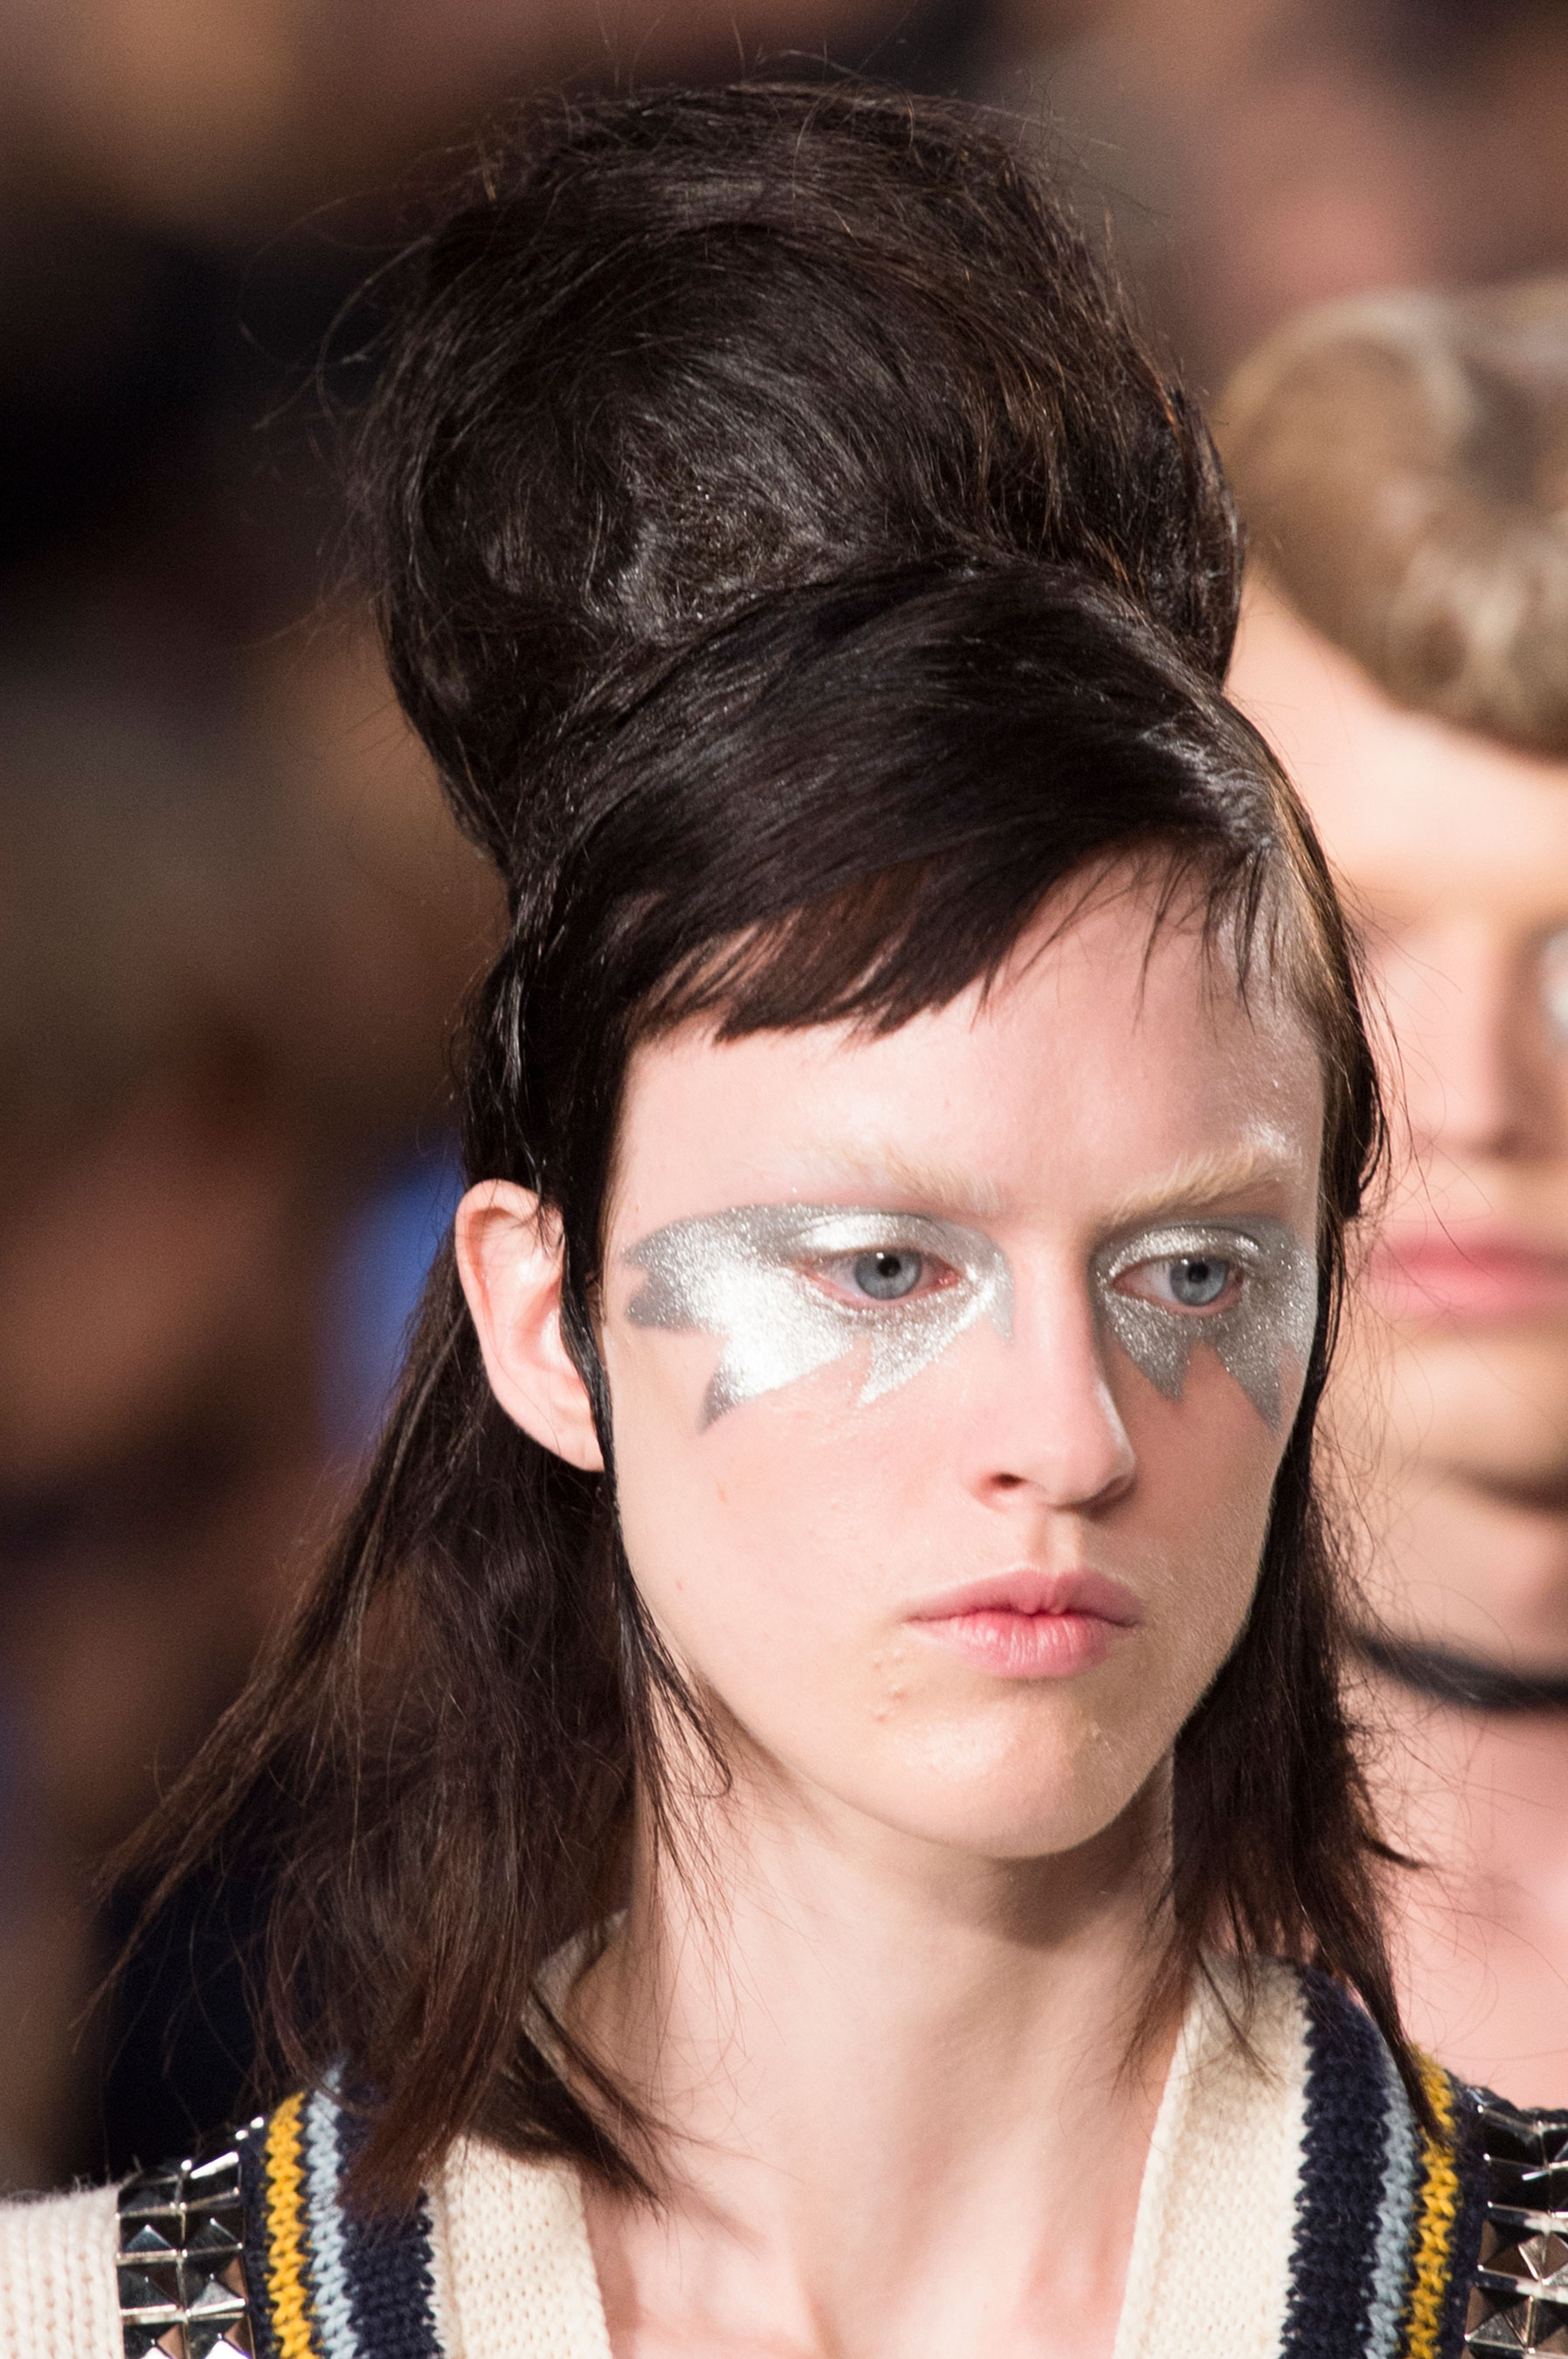 Maison-Margiela-spring-2016-runway-beauty-fashion-show-the-impression-074